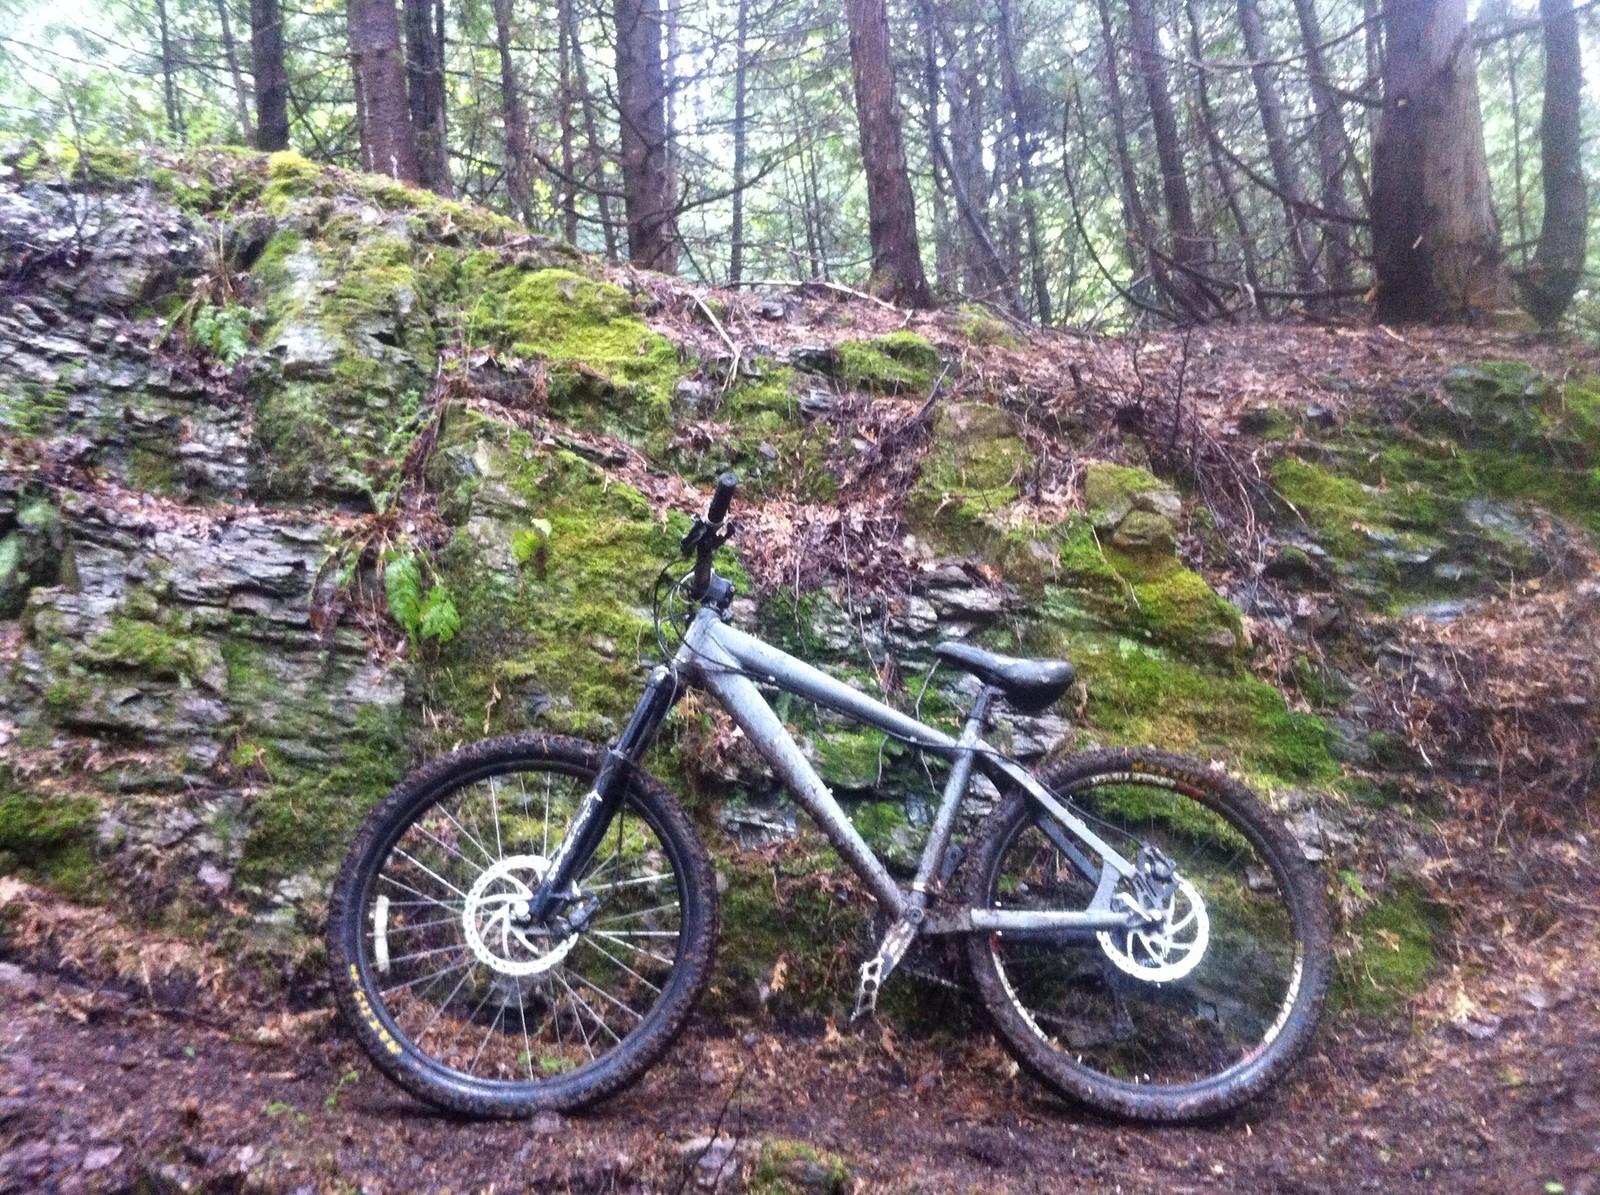 image - Michael_MacBeth - Mountain Biking Pictures - Vital MTB